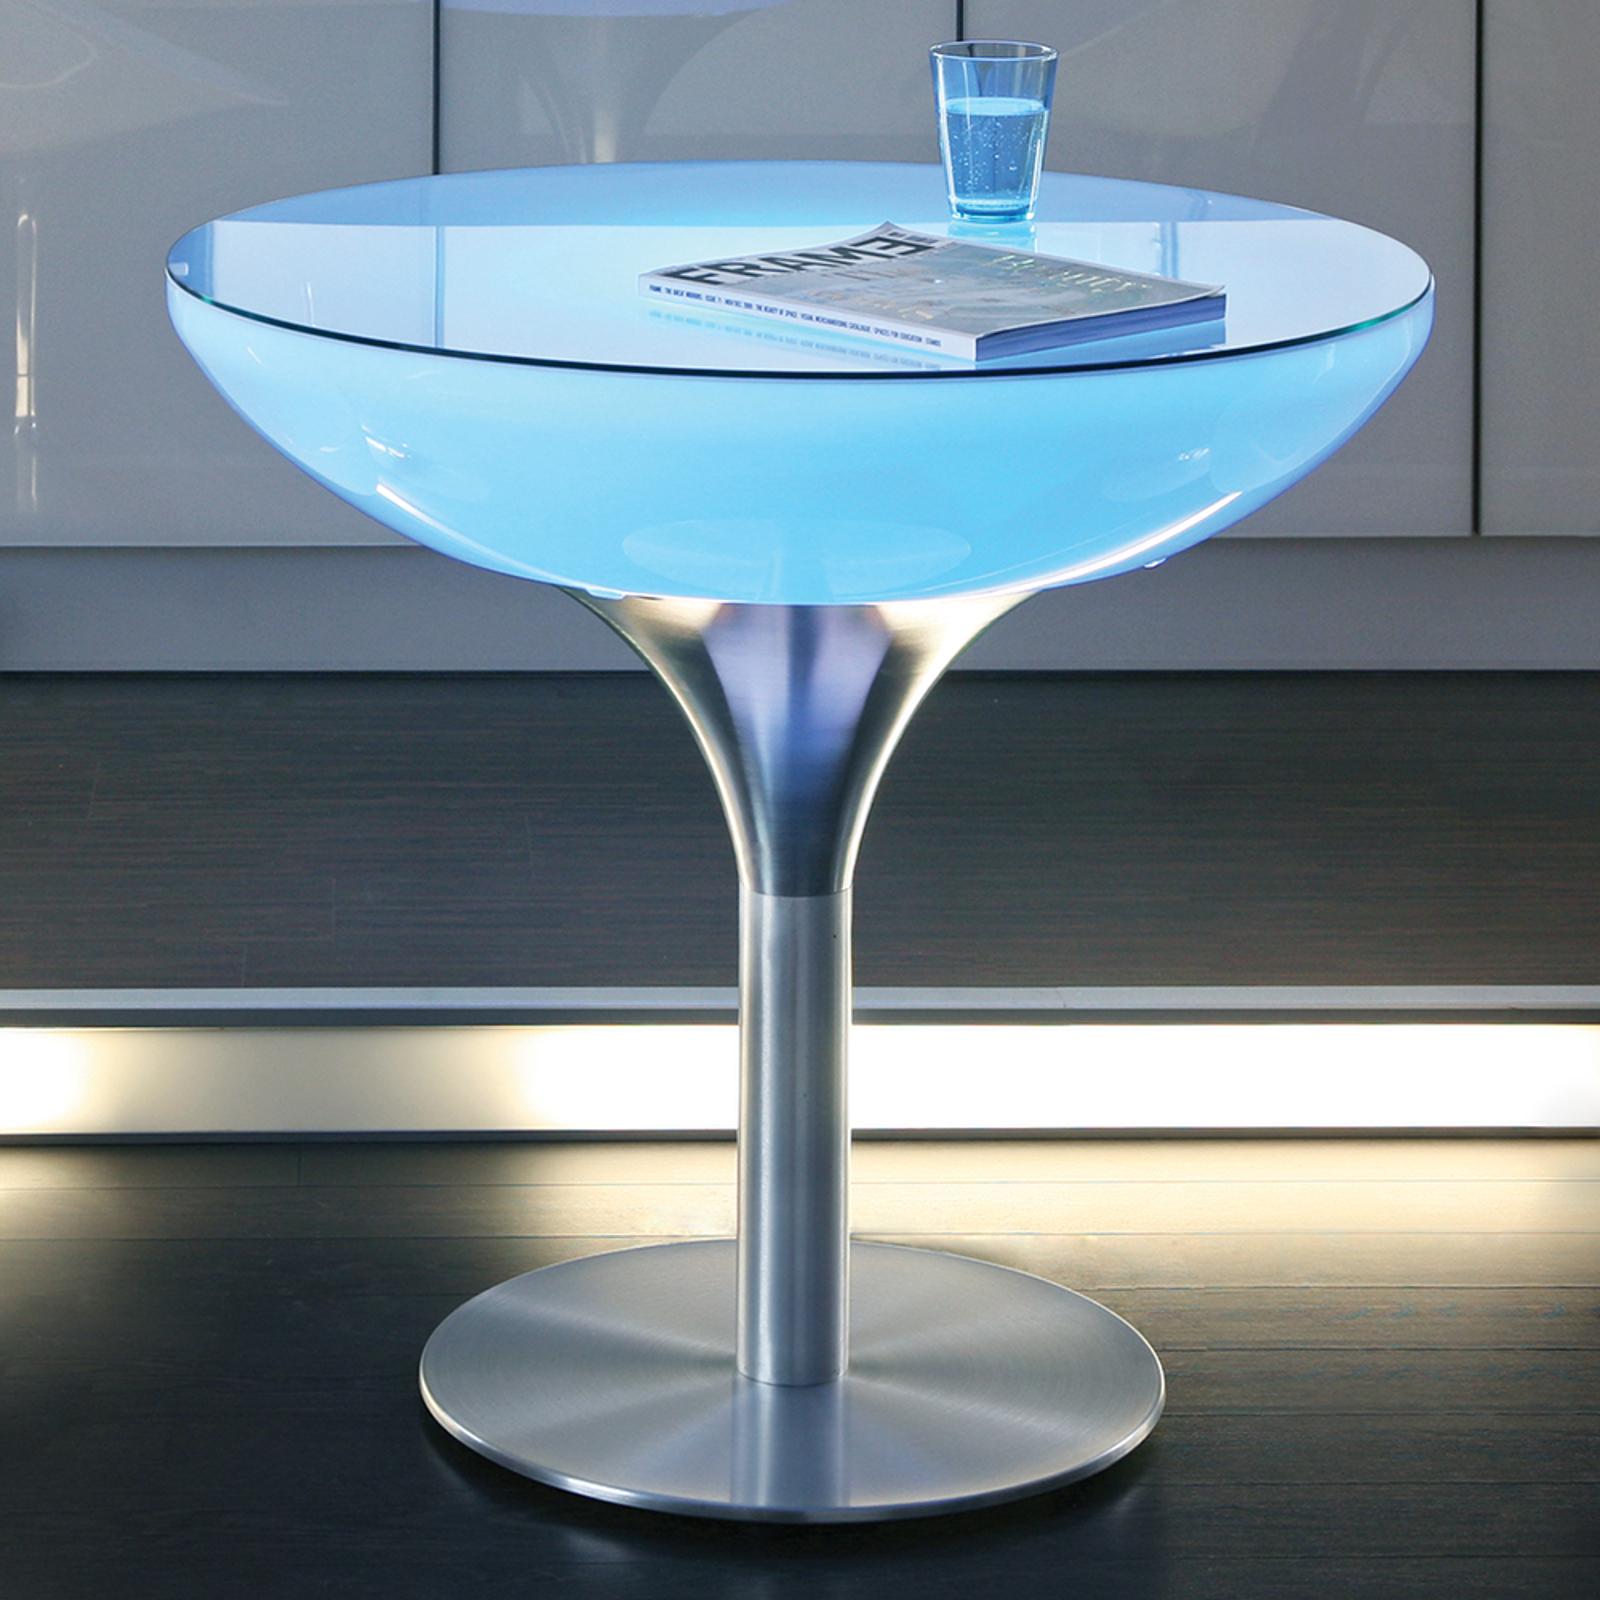 Leuchttisch Lounge Table LED Pro Accu H 75 cm